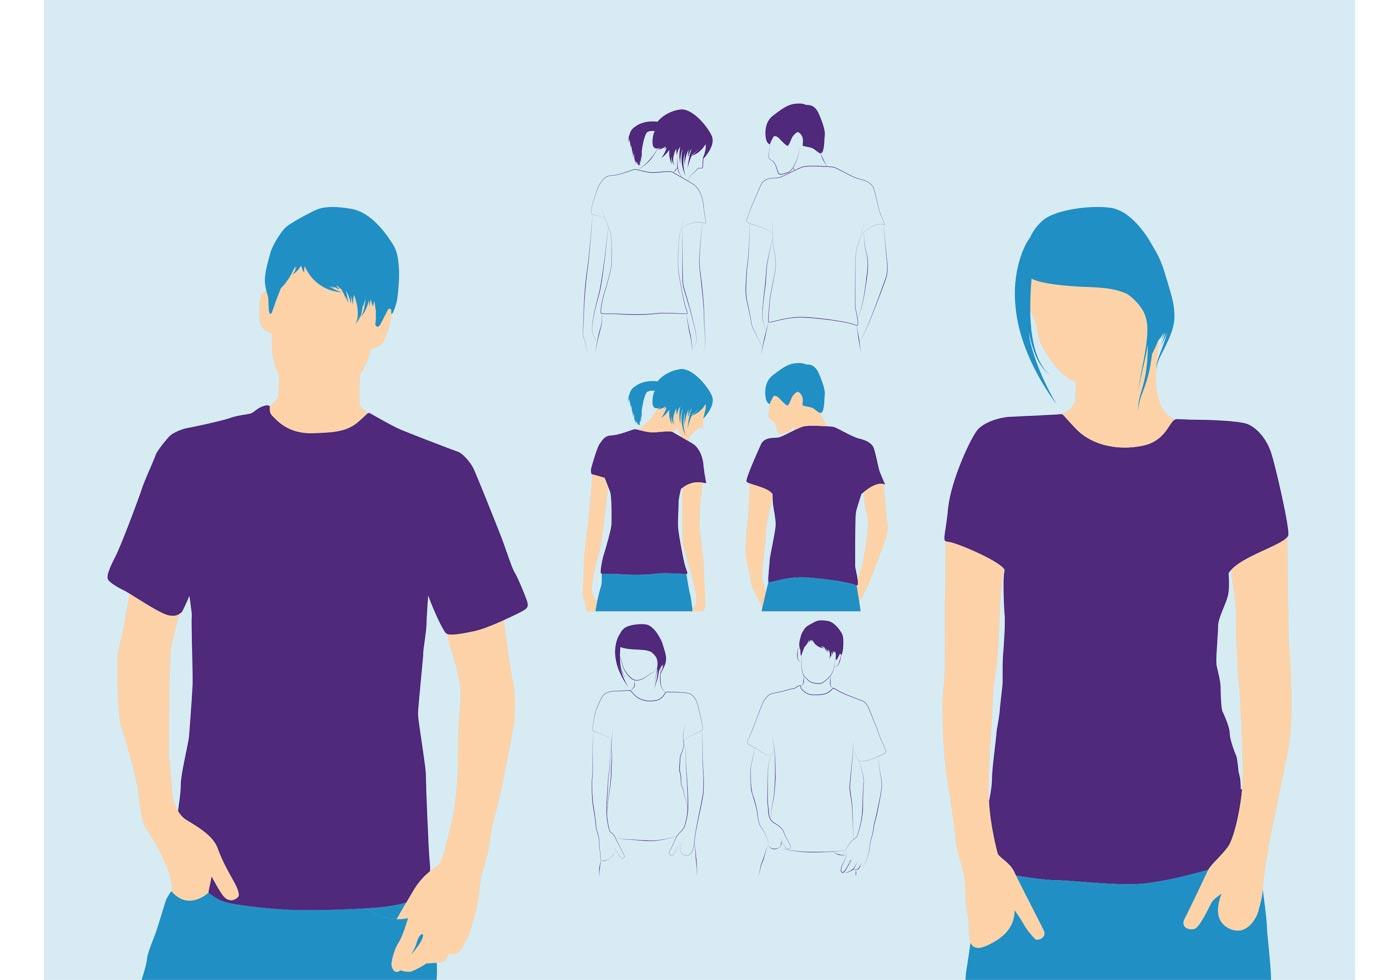 tshirts models download free vector art stock graphics